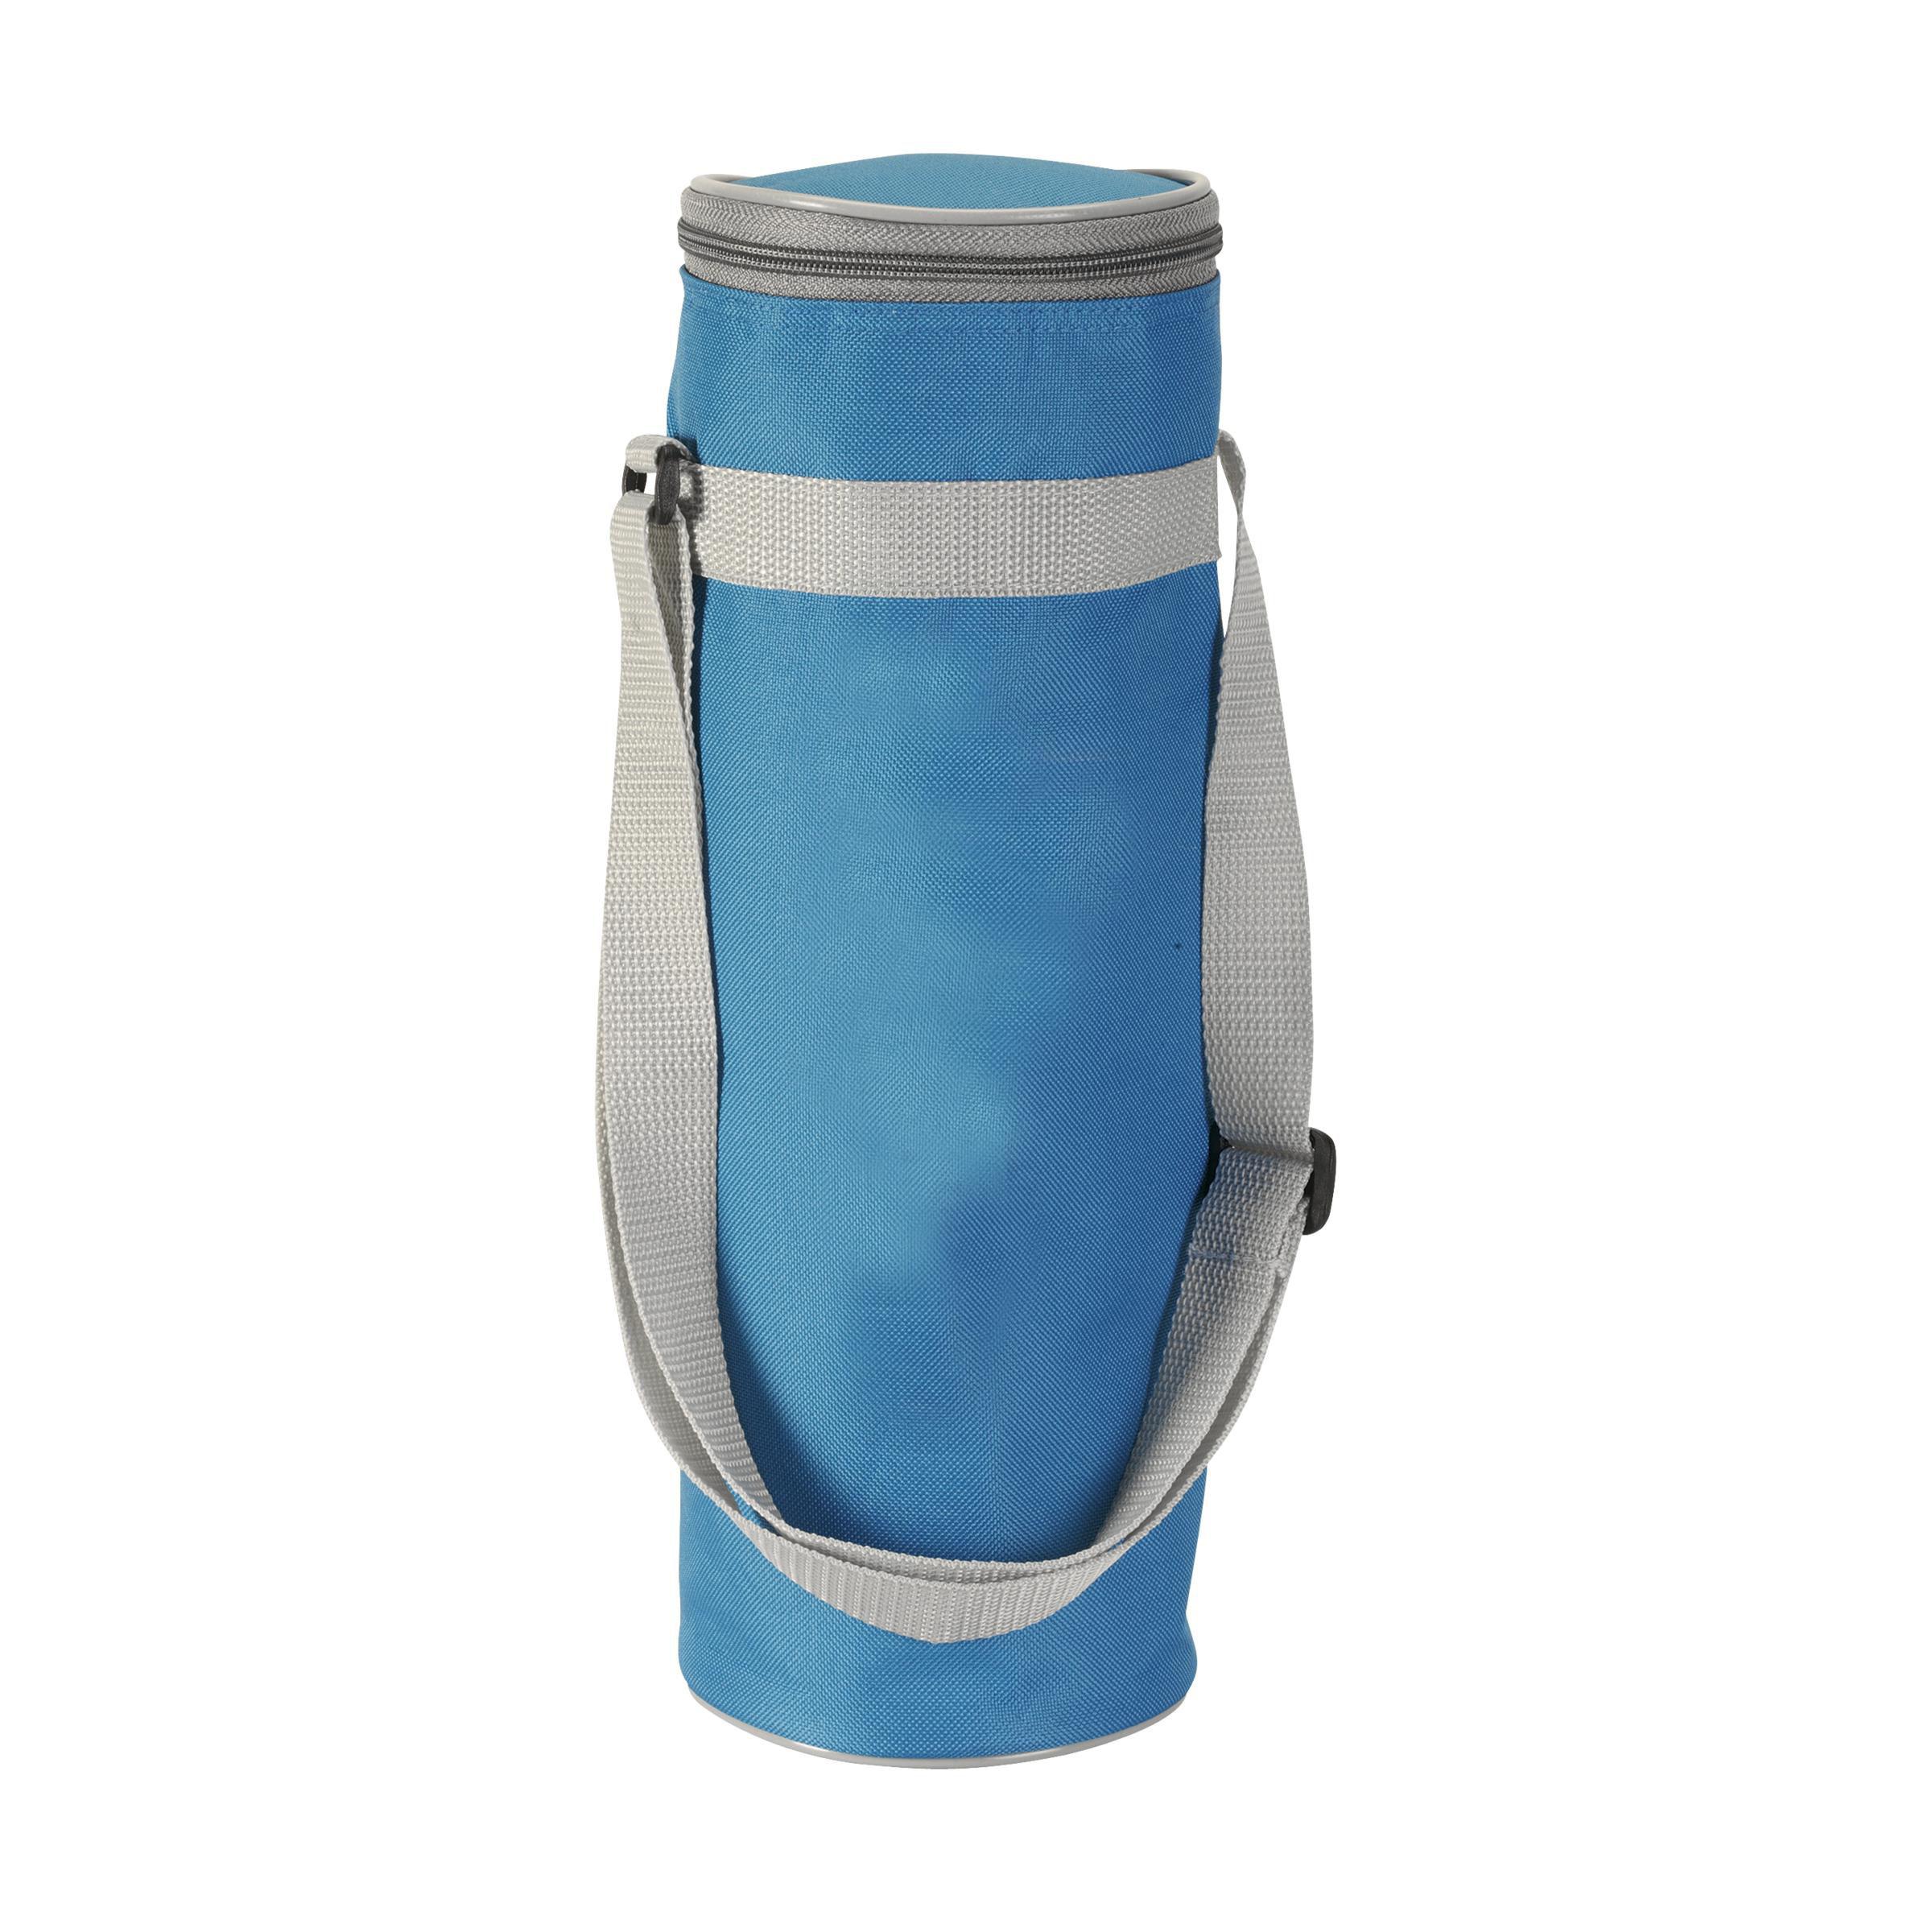 Bottle Cooler Bag Picnic Festival Outdoor Drinks Carrier